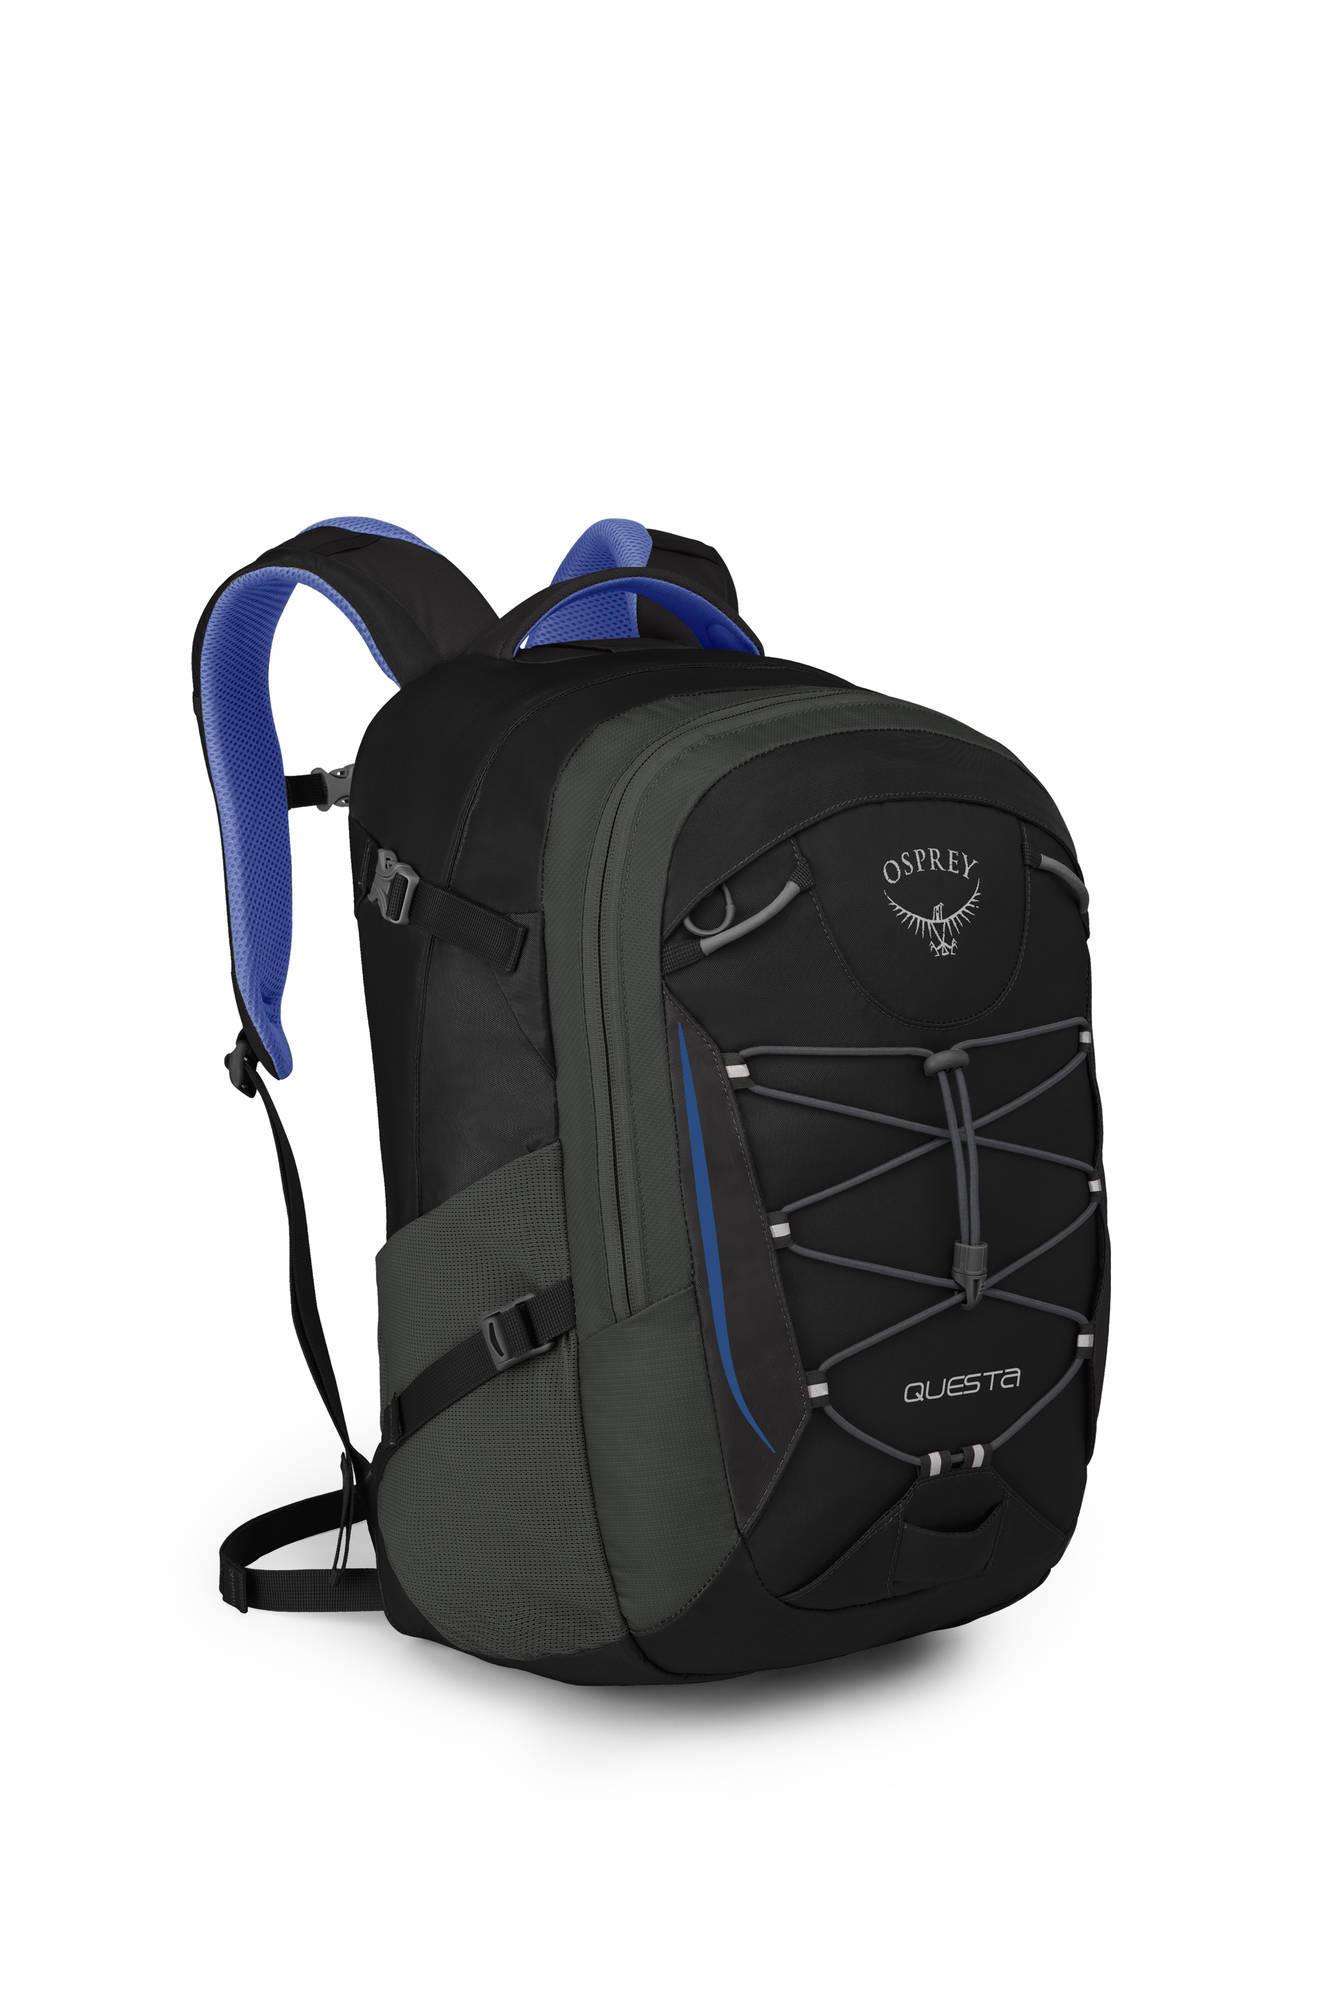 Городские рюкзаки Рюкзак женский Osprey Questa 27 Black Orchid Questa_27_Side_Black_Orchid_web.jpg